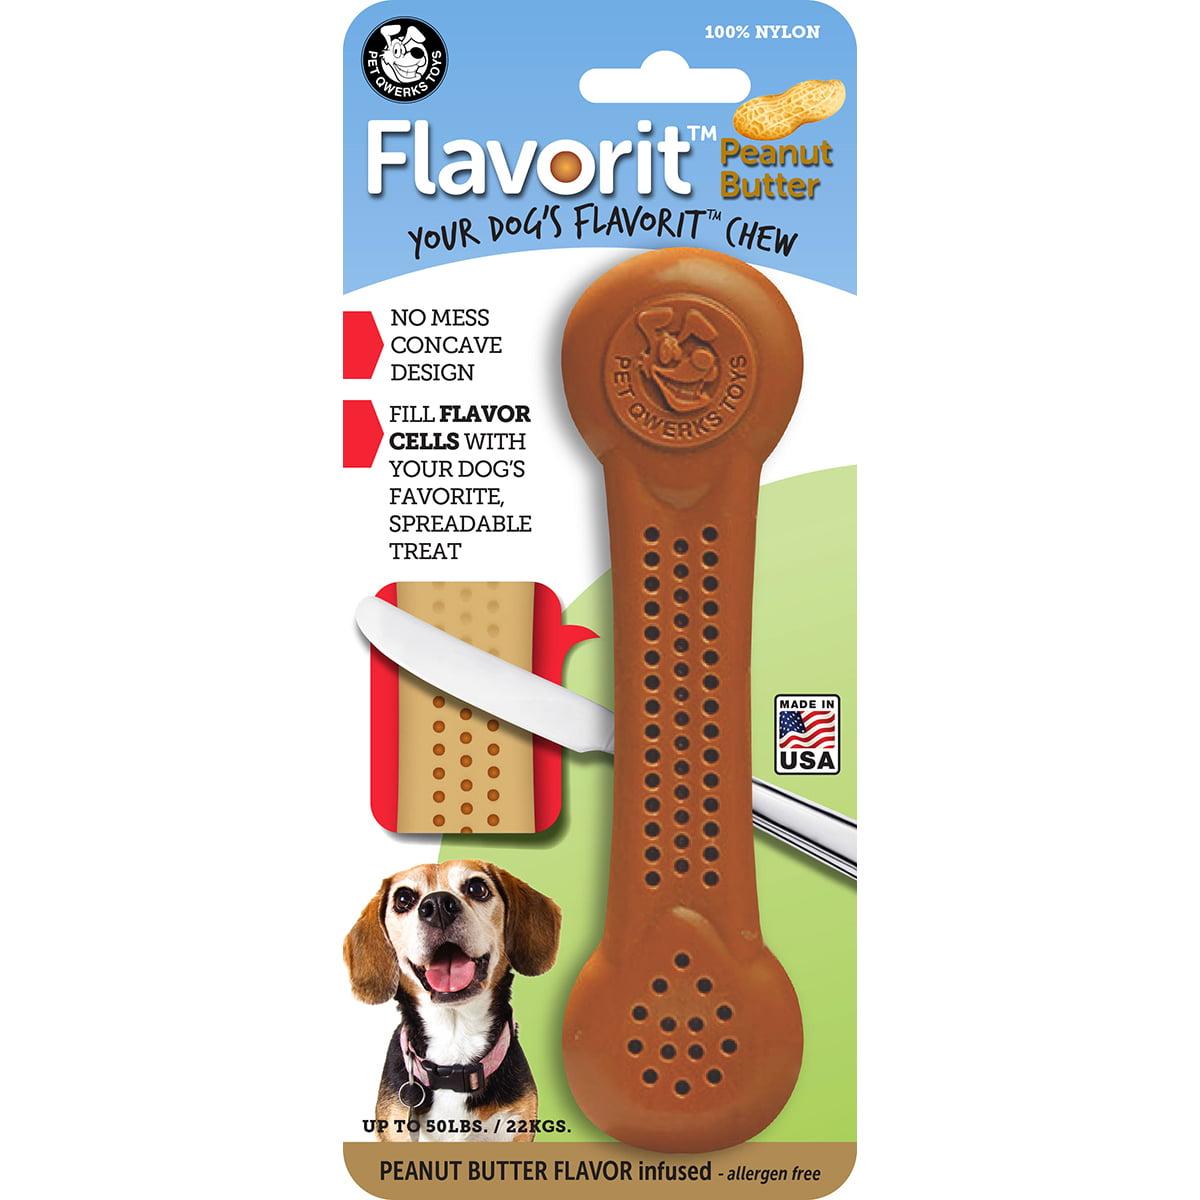 Flavorit Nylon Bone-Peanut Butter Large - image 1 of 1